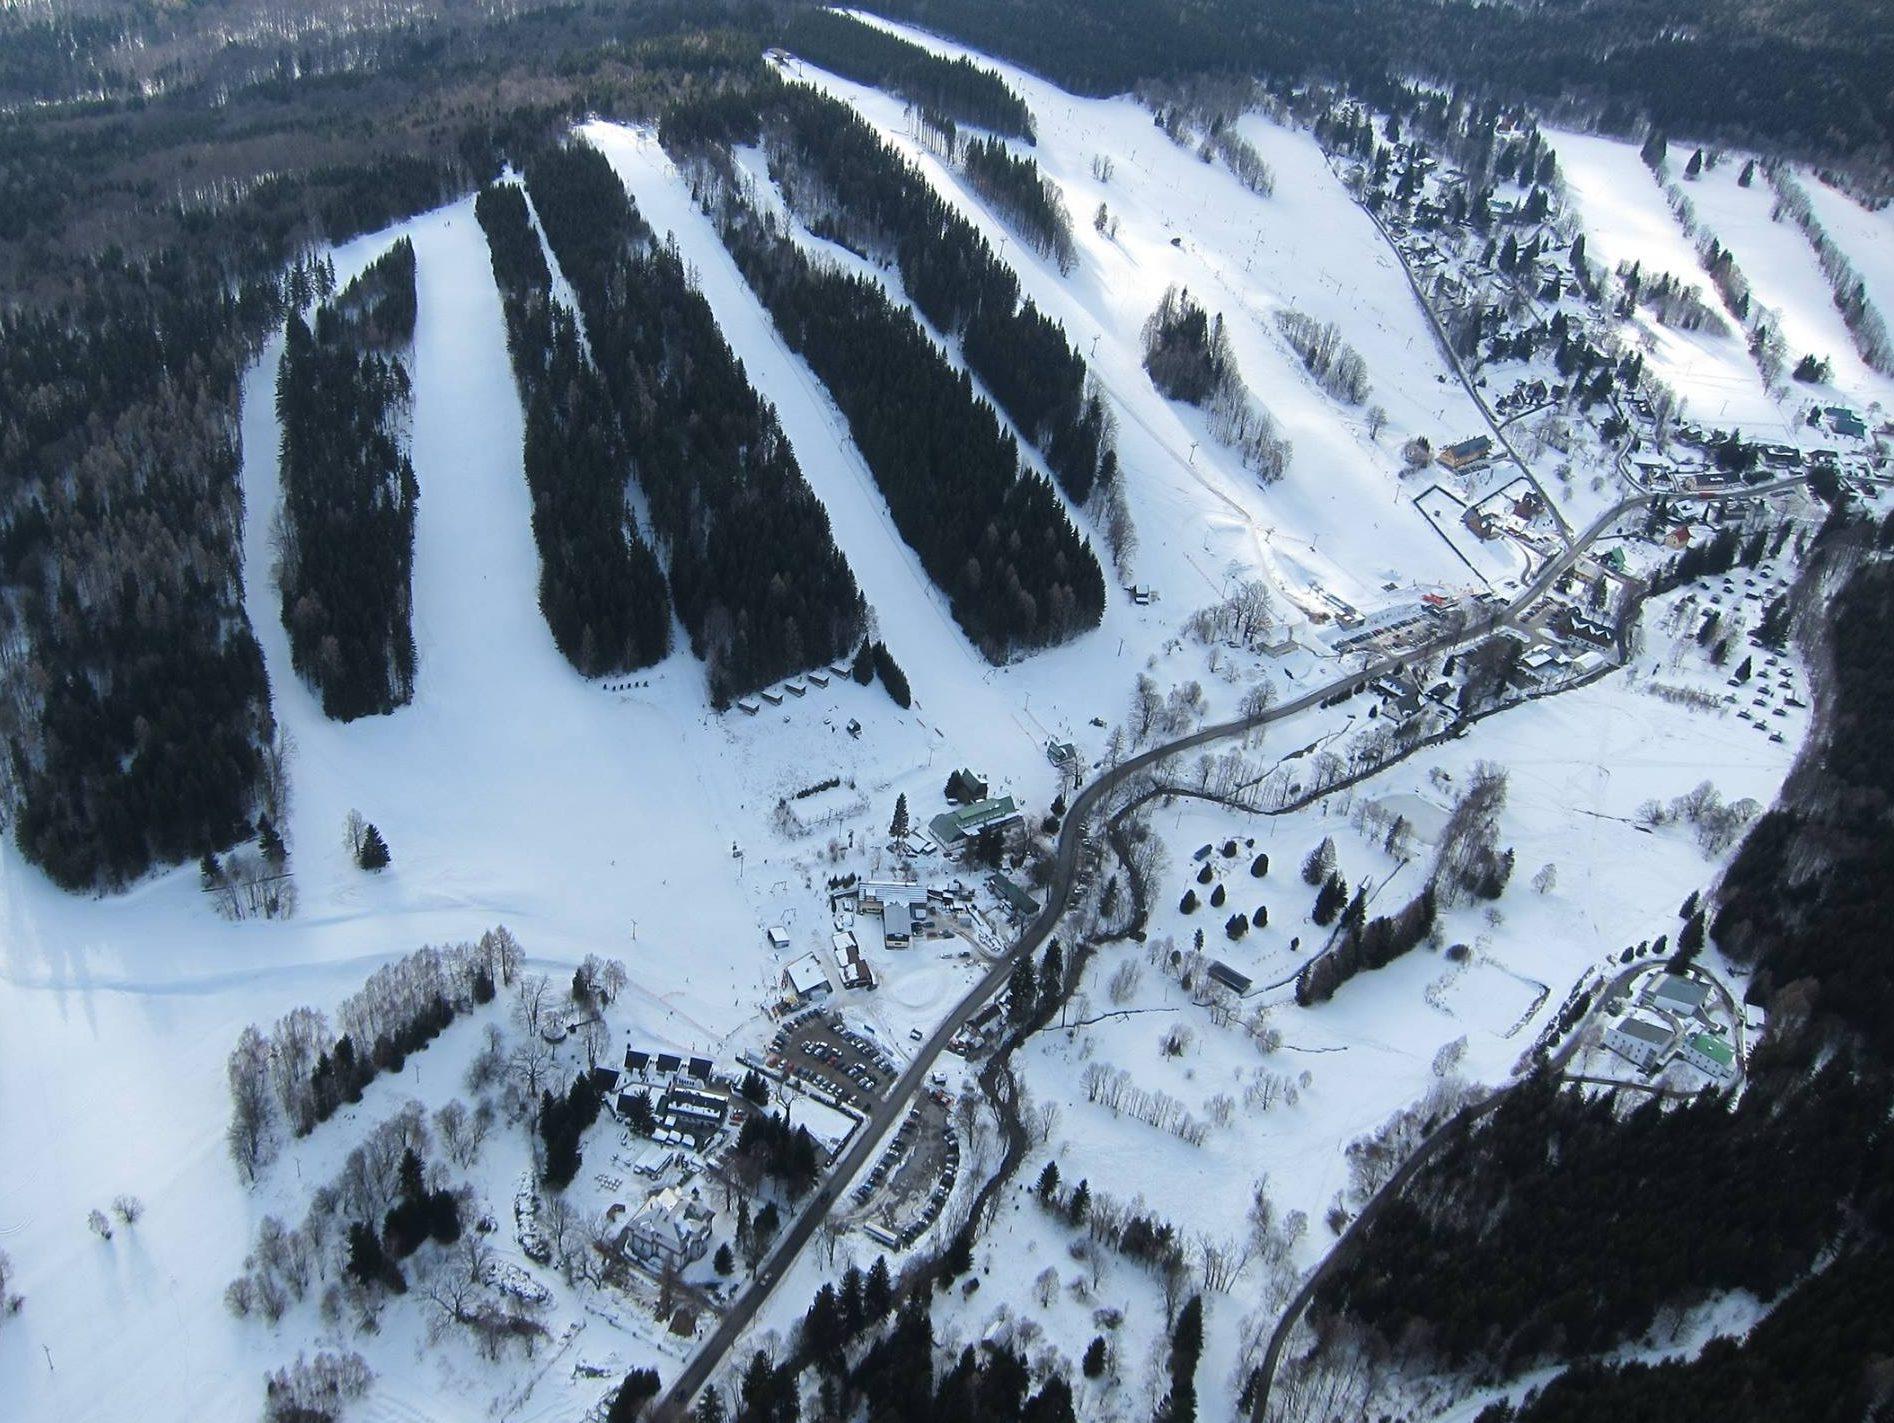 Webkamera – Online – Malá Morávka – Ski Arena Karlov